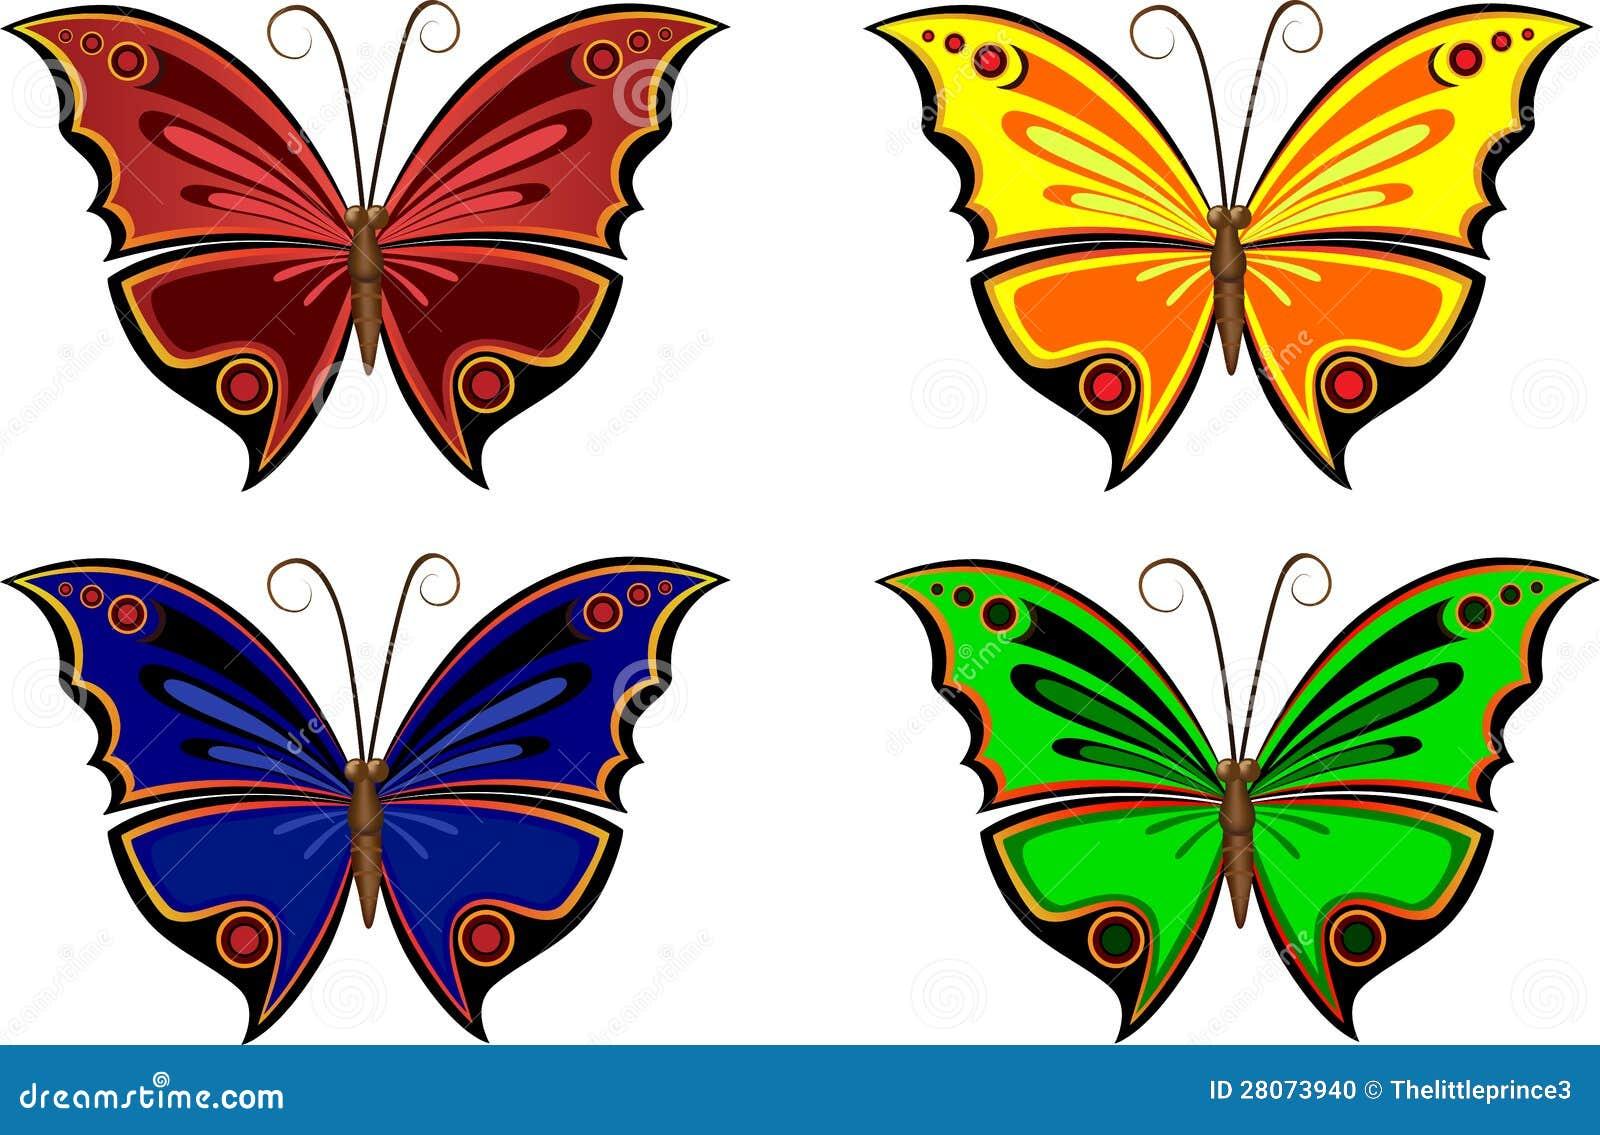 Dibujos de mariposas a color - Imagui